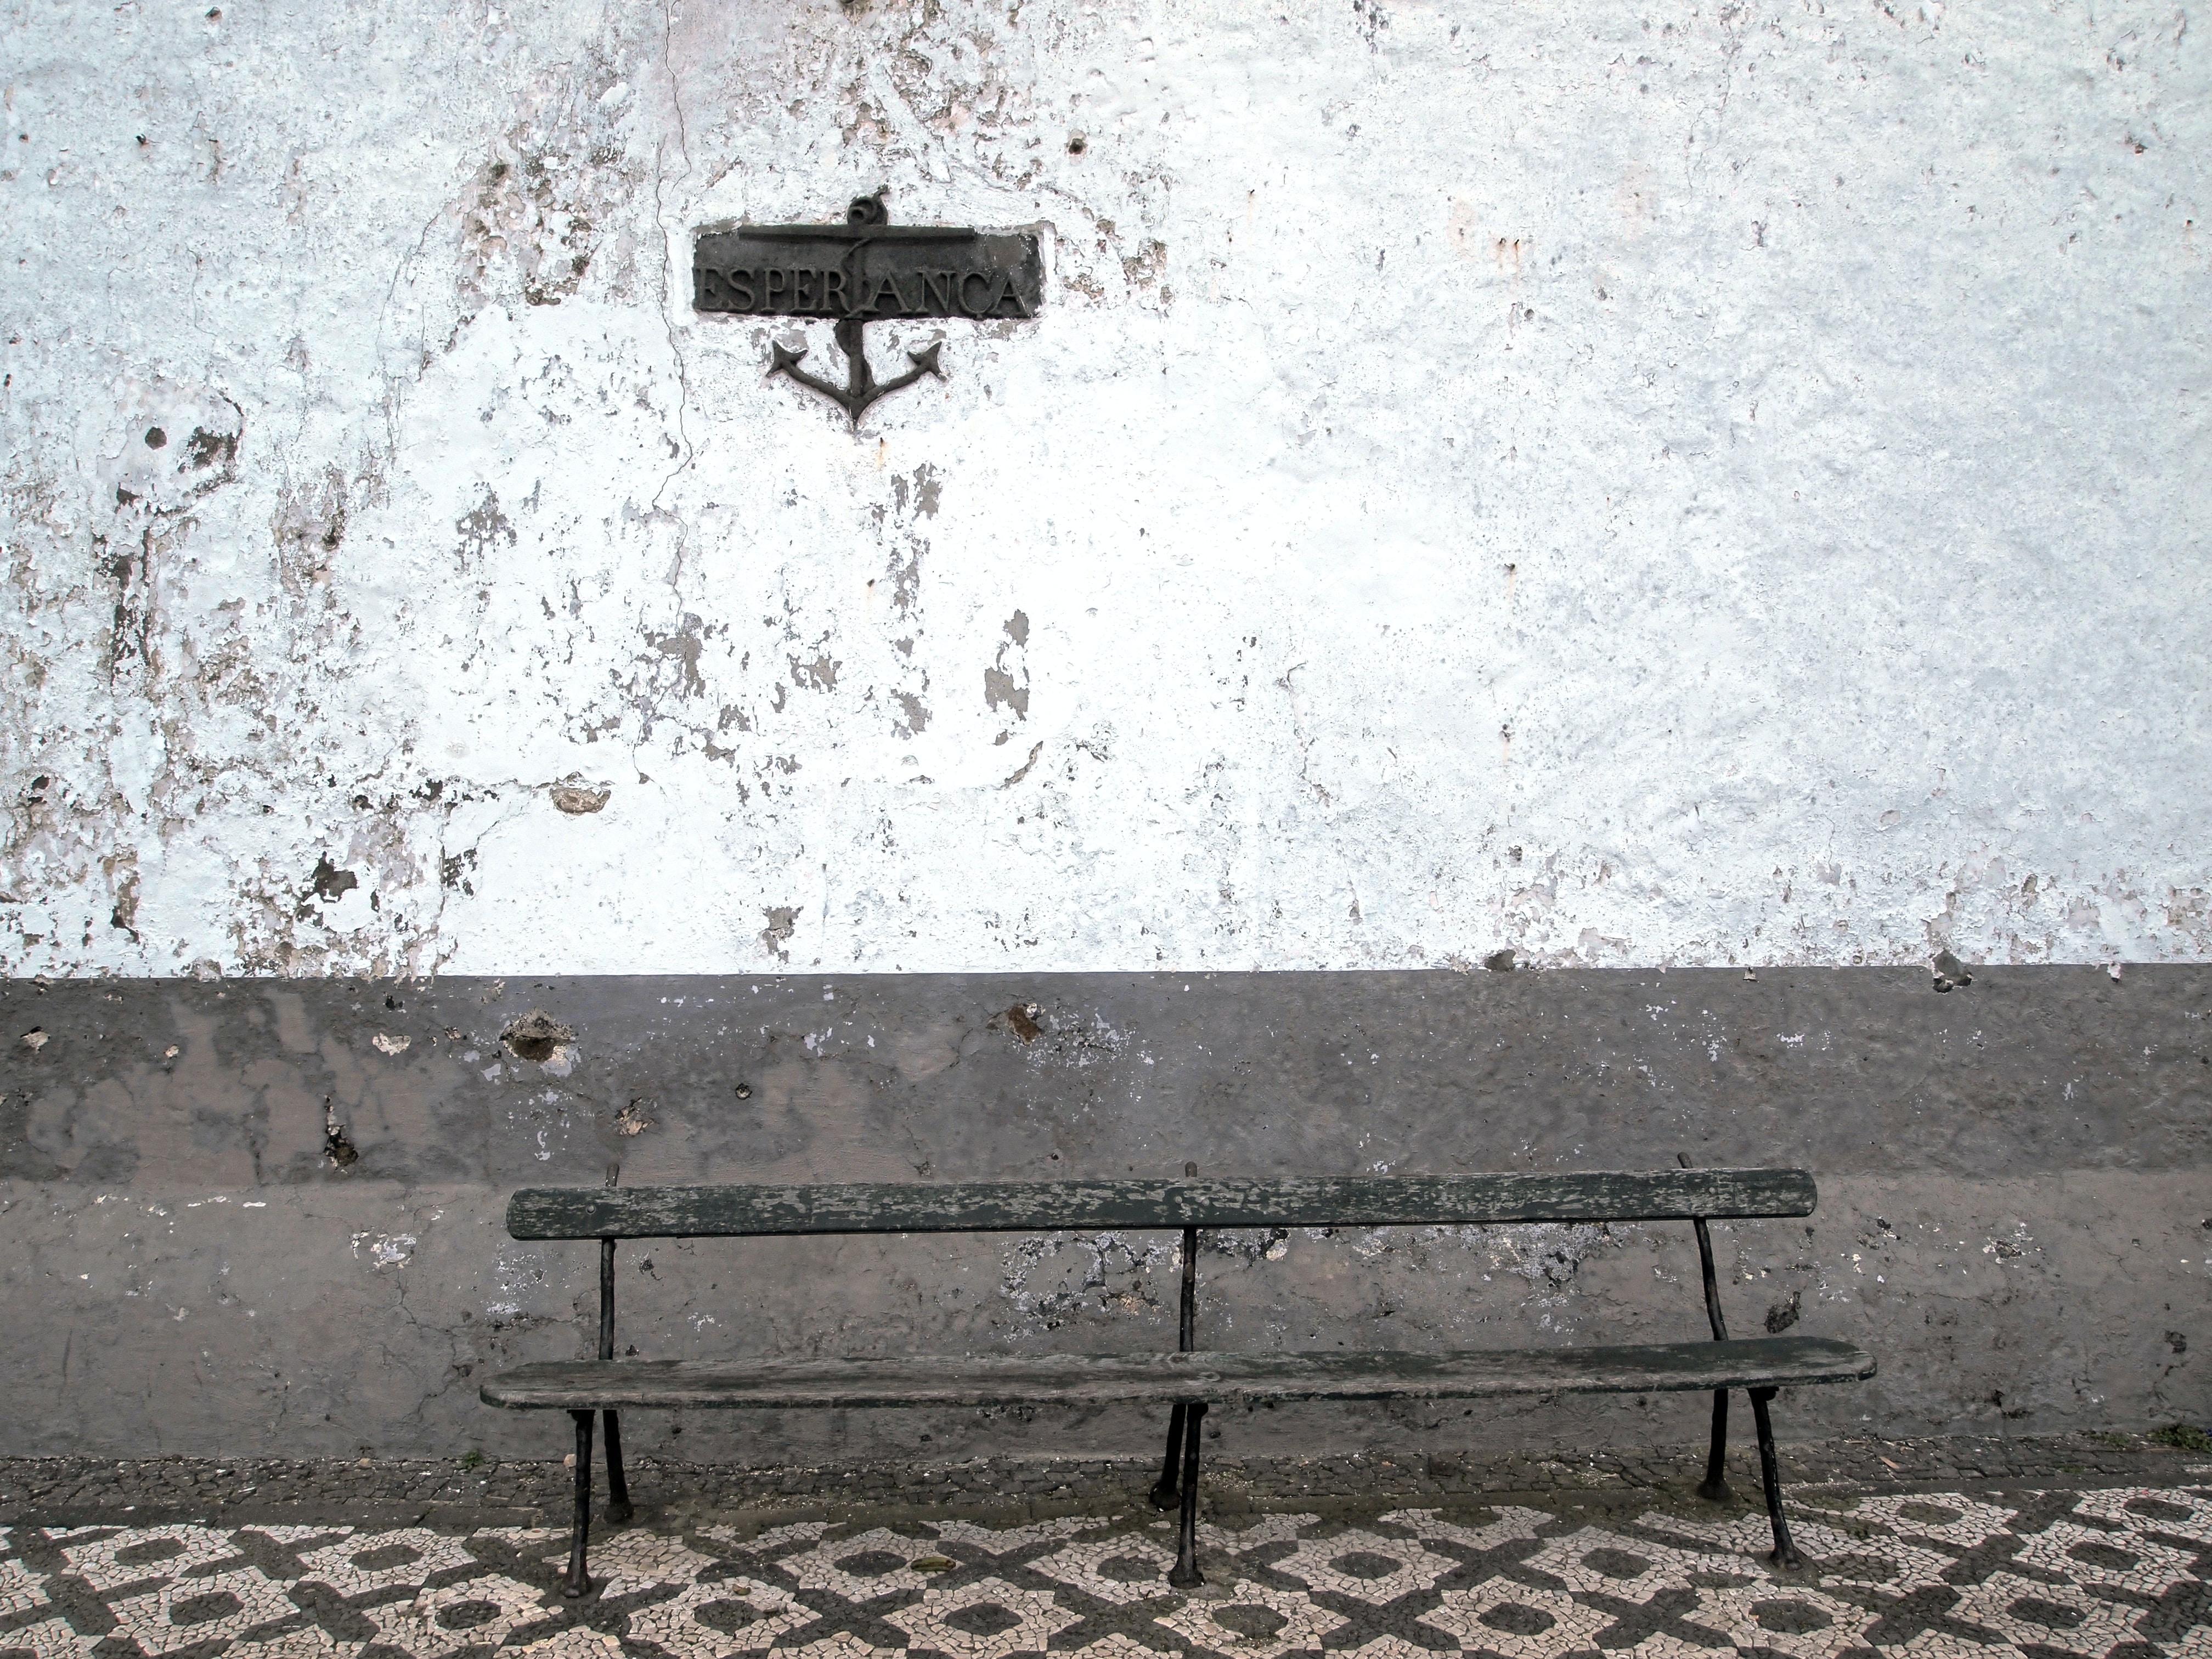 Free Unsplash photo from Rodrigo Melo